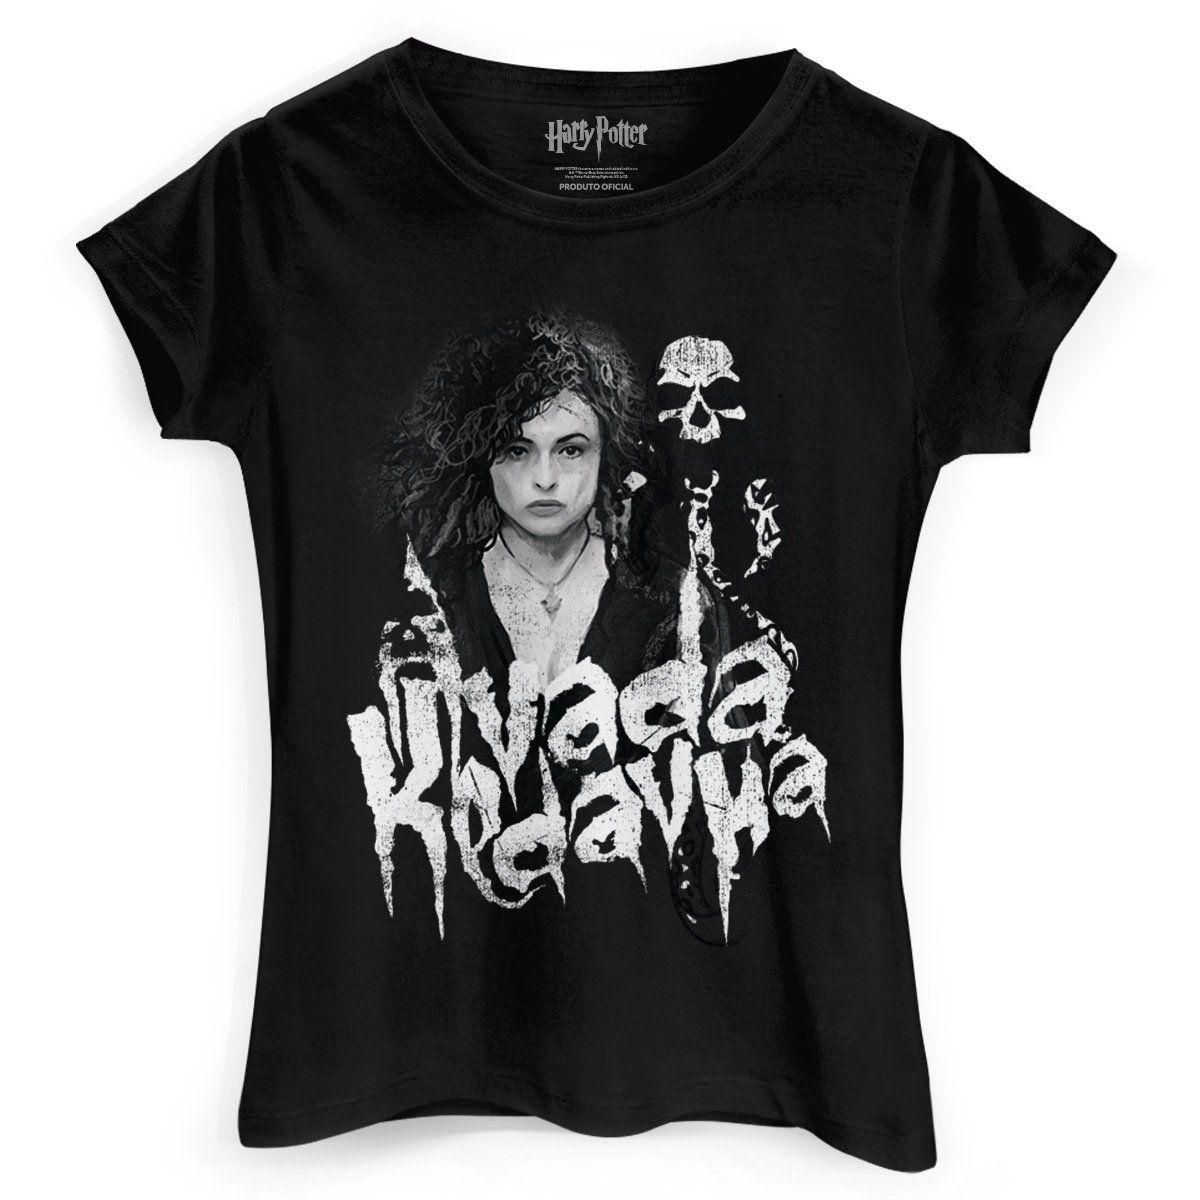 Camiseta Feminina Harry Potter Bellatrix Lestrange  - bandUP Store Marketplace